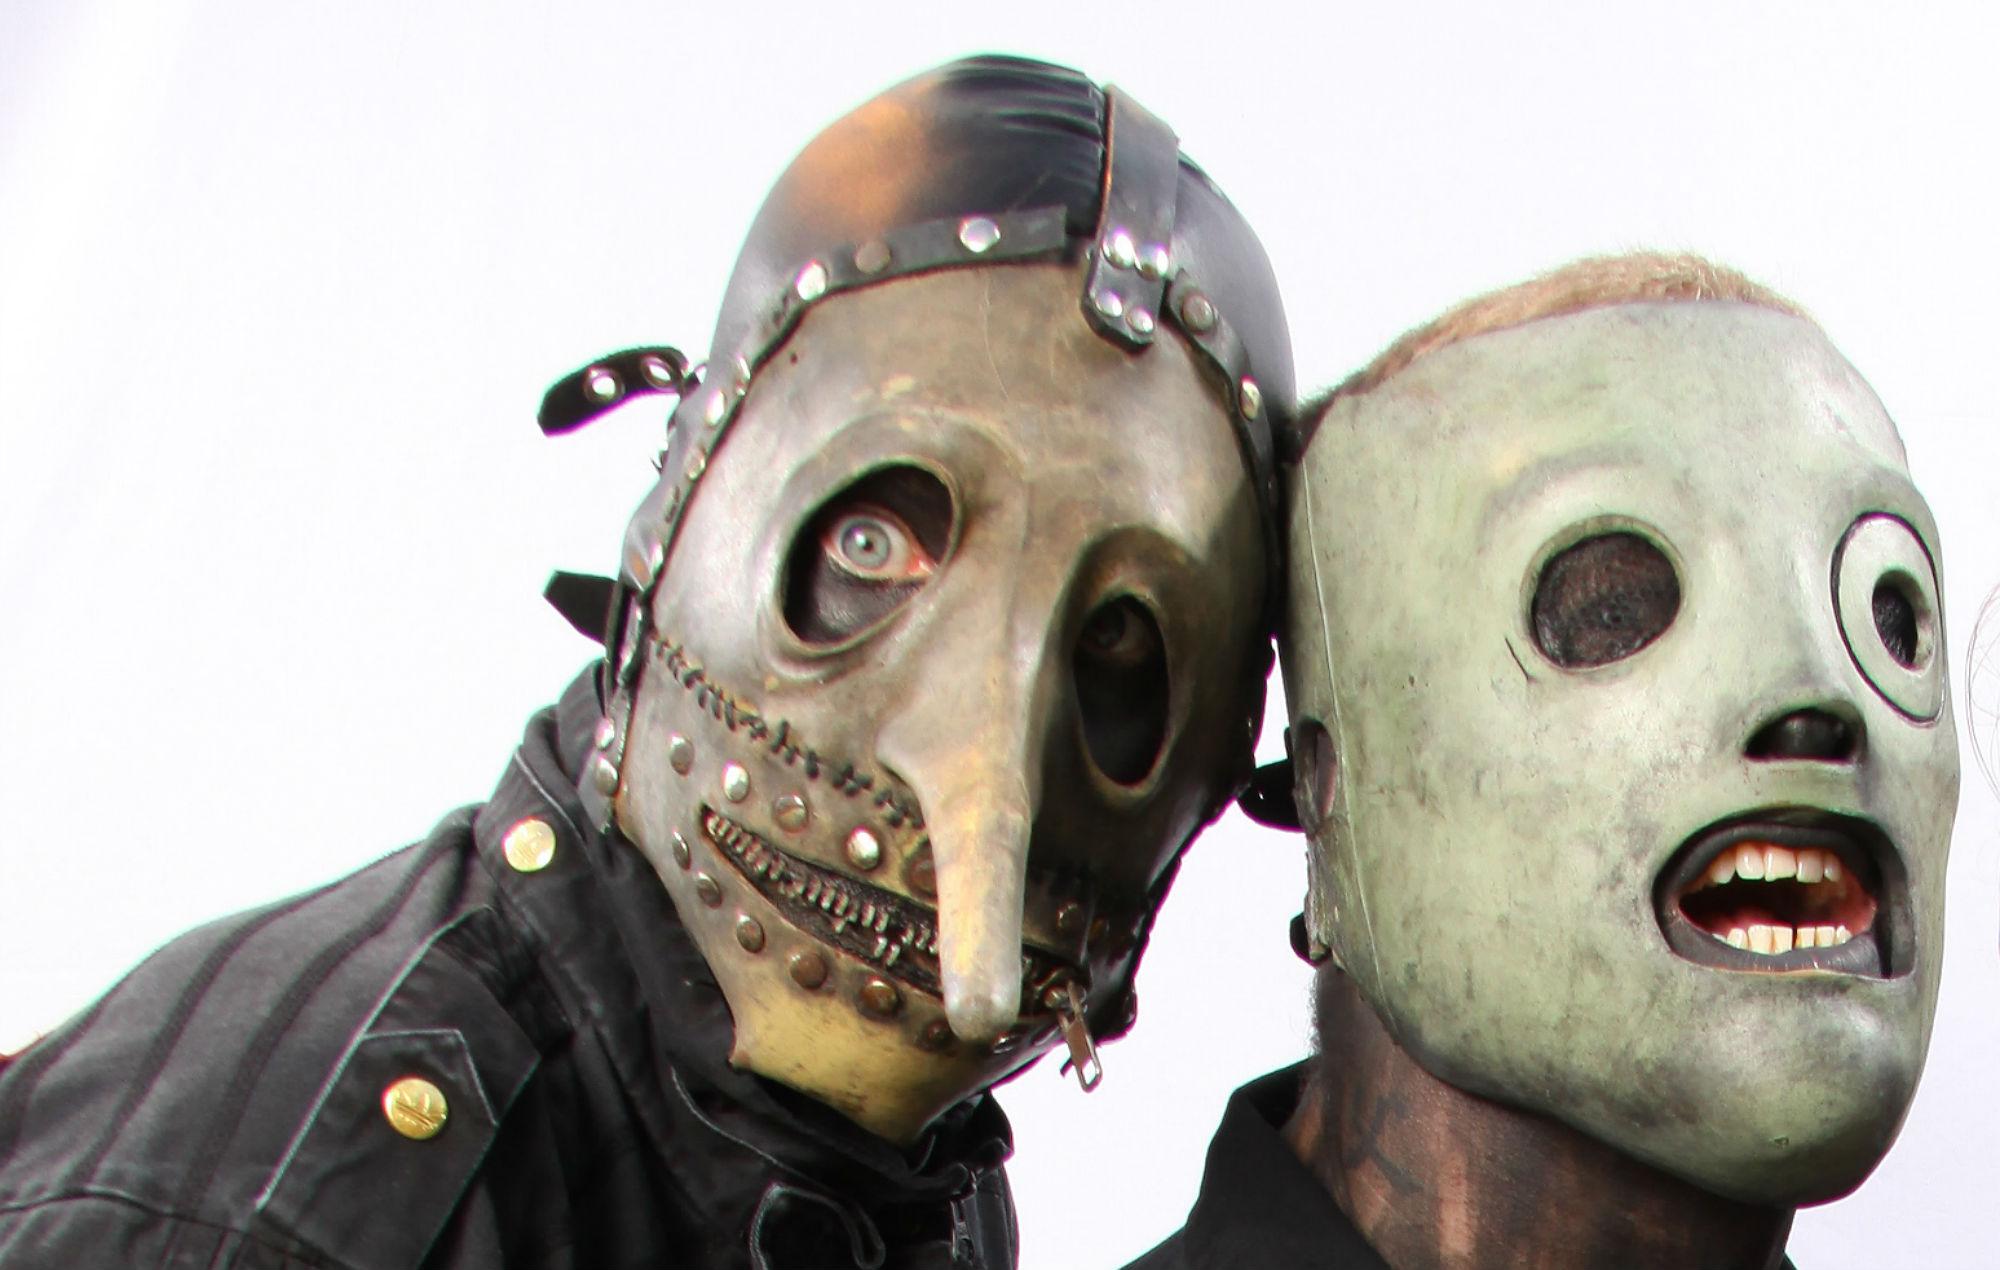 Slipknot's Corey Taylor: